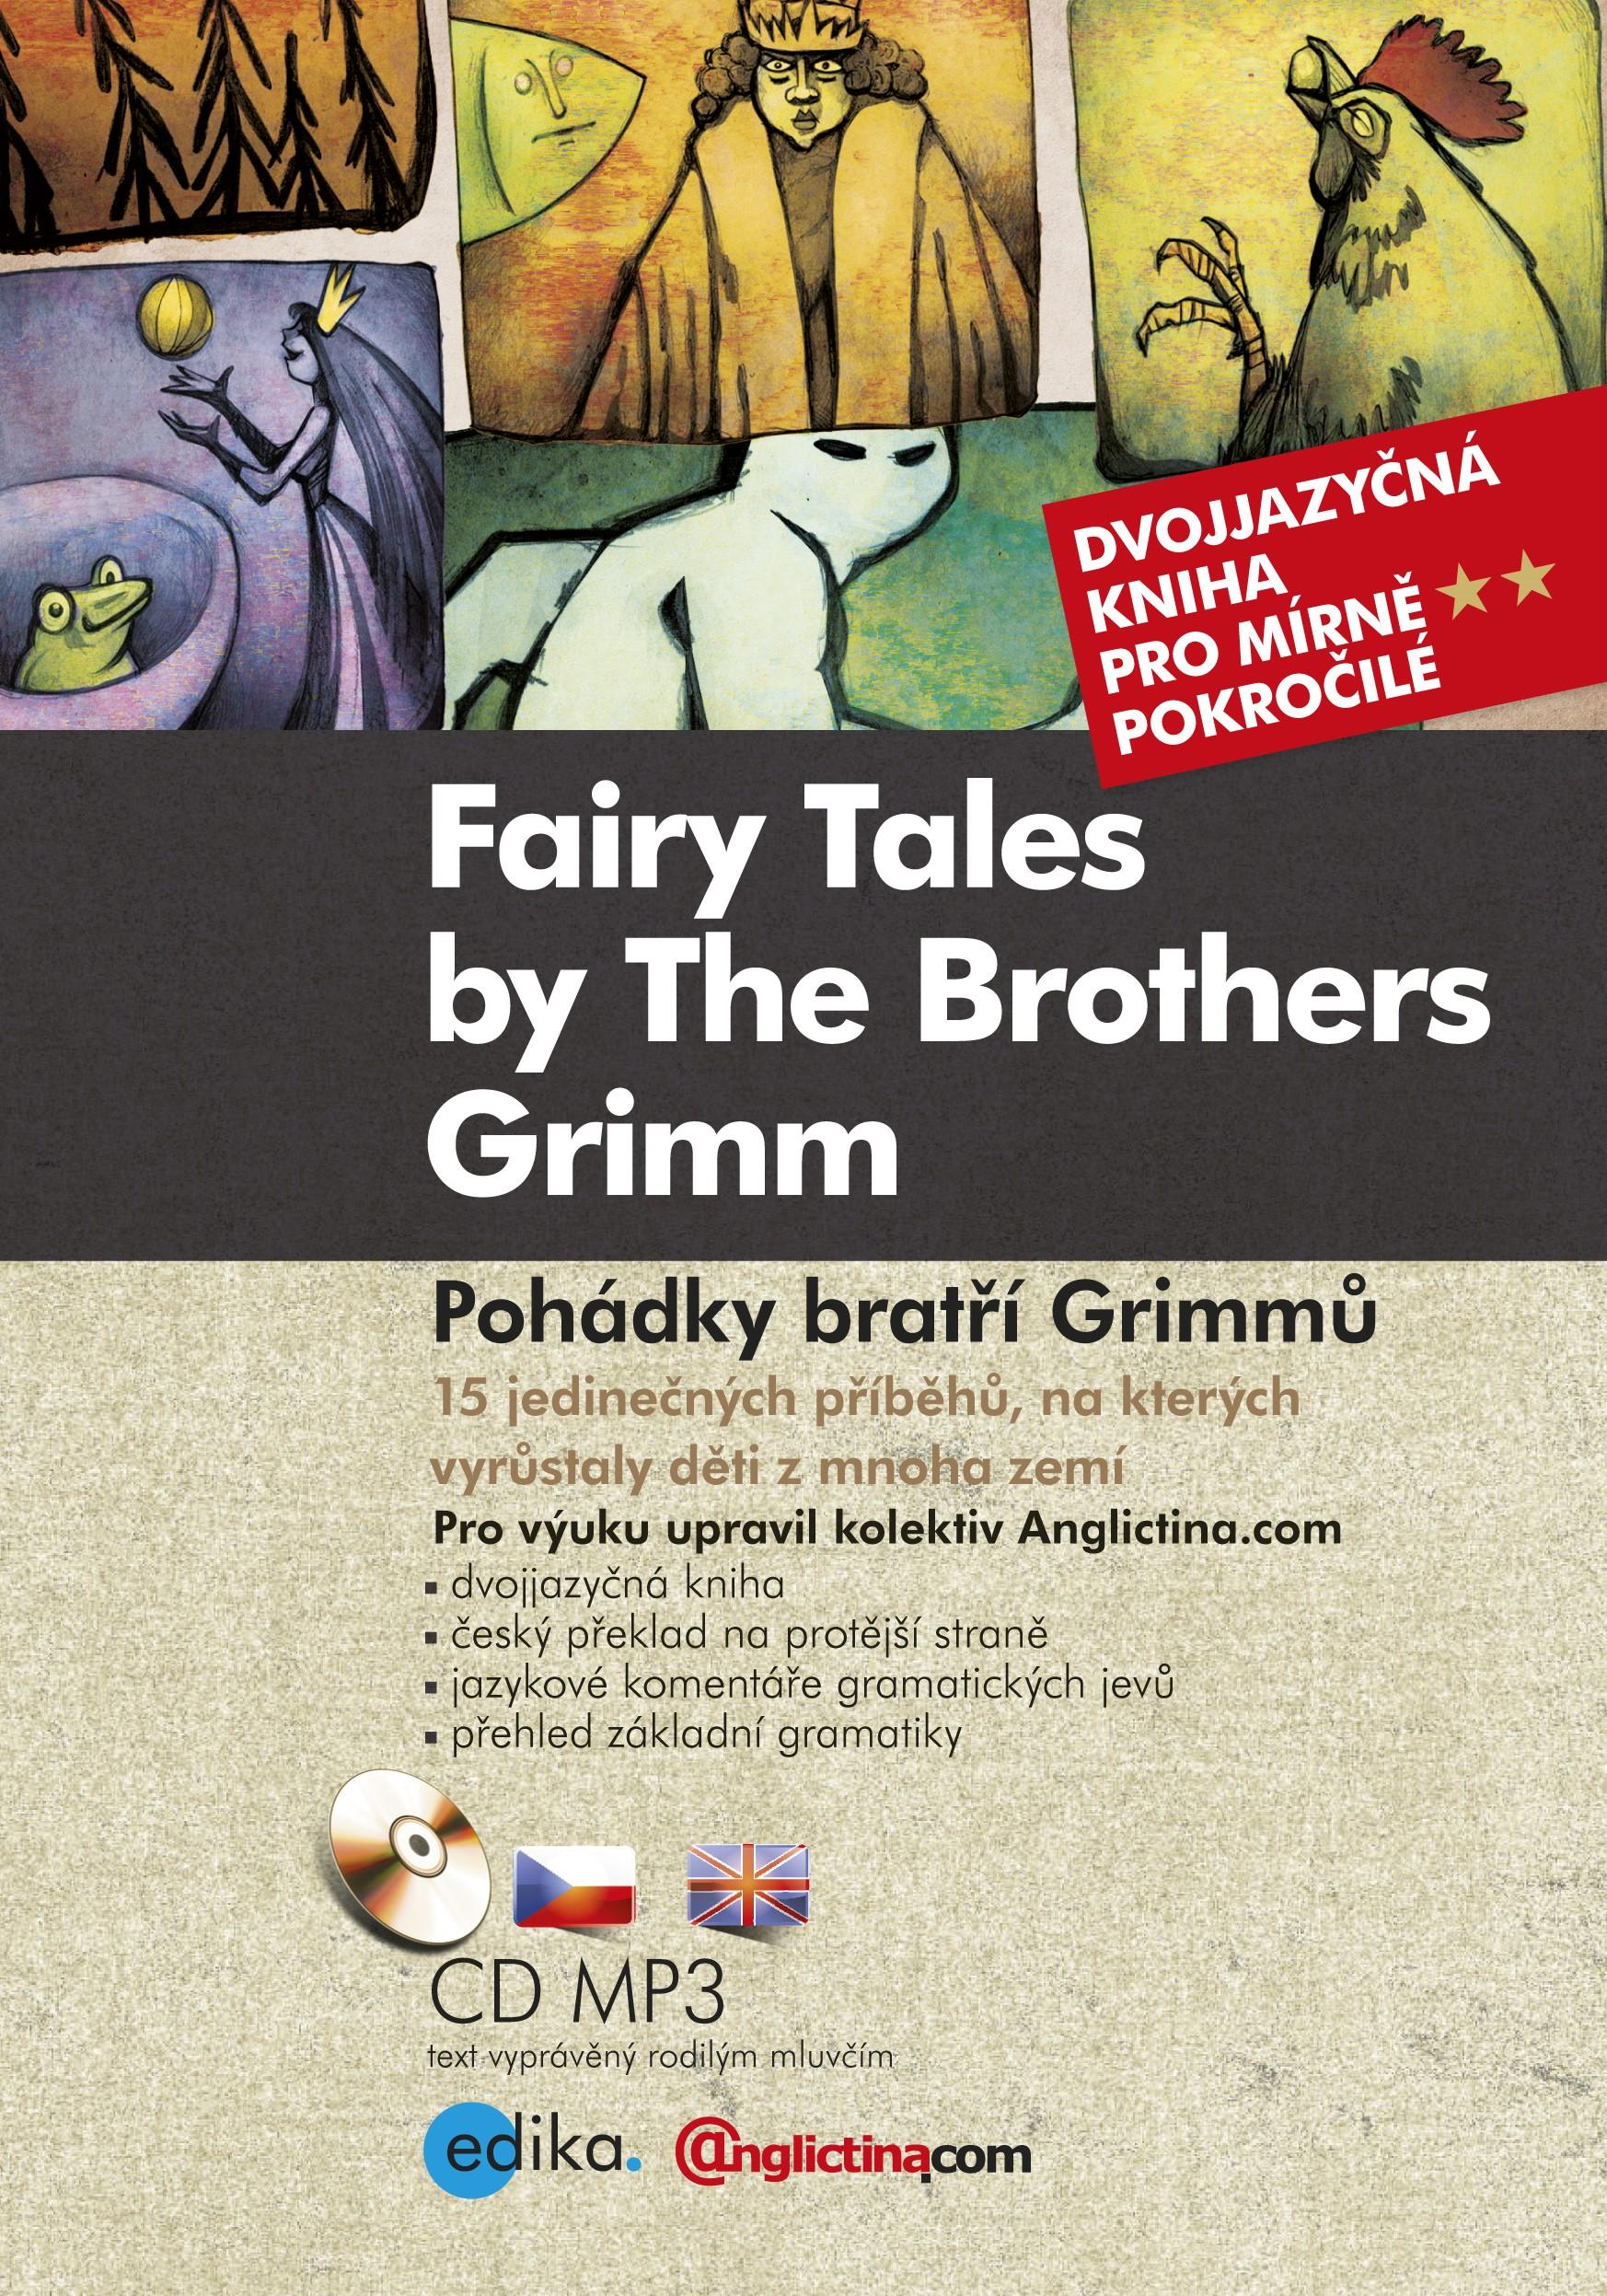 POHÁDKY BRATŘÍ GRIMMŮ - FAIRY TALES BY THE BROTHERS GRIMM